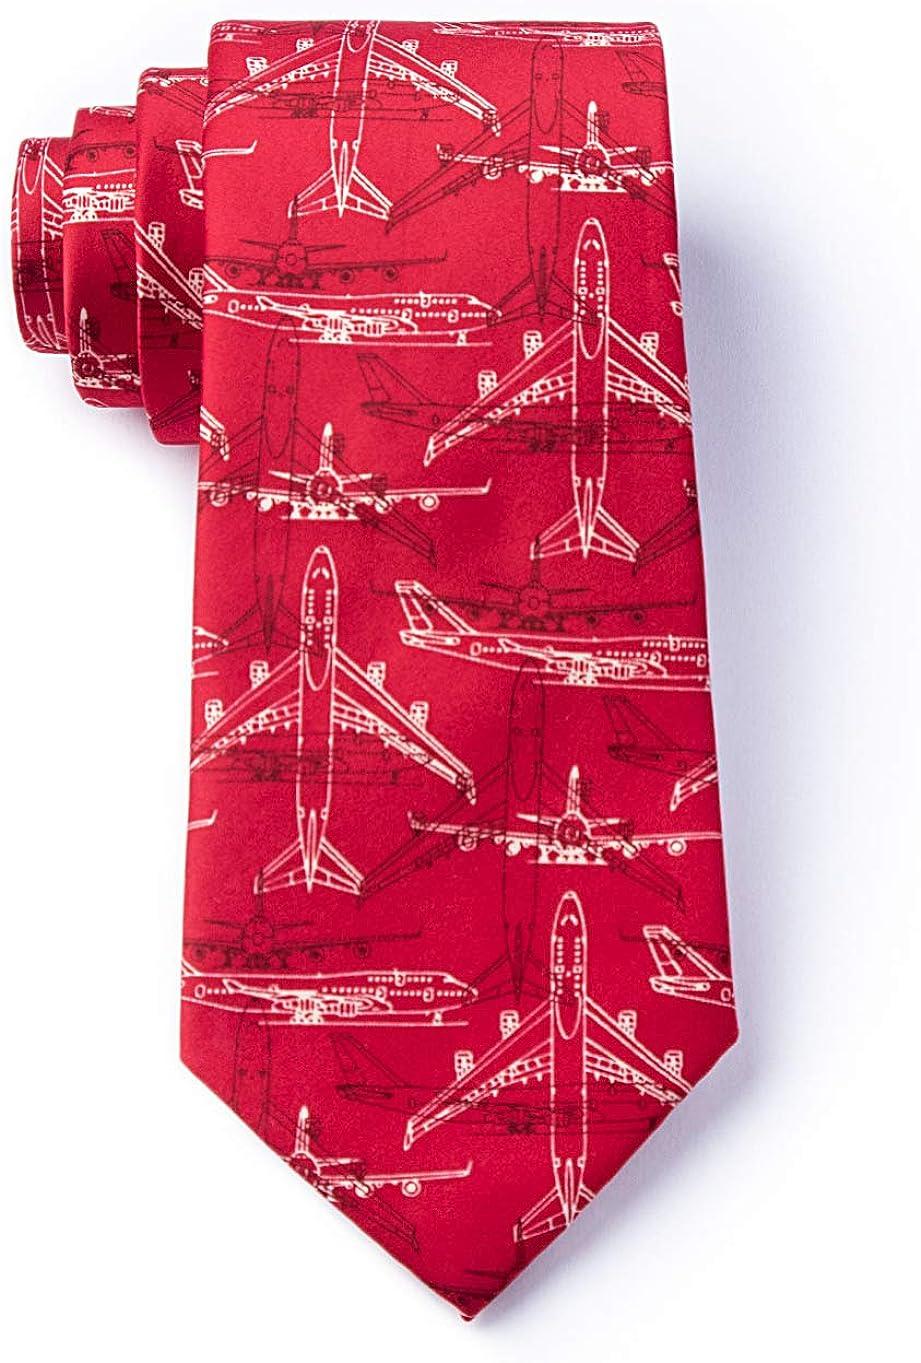 Mens Microfiber Boeing 747 Airplane Plane Pilot Aviation XL Extra Long Tie Necktie